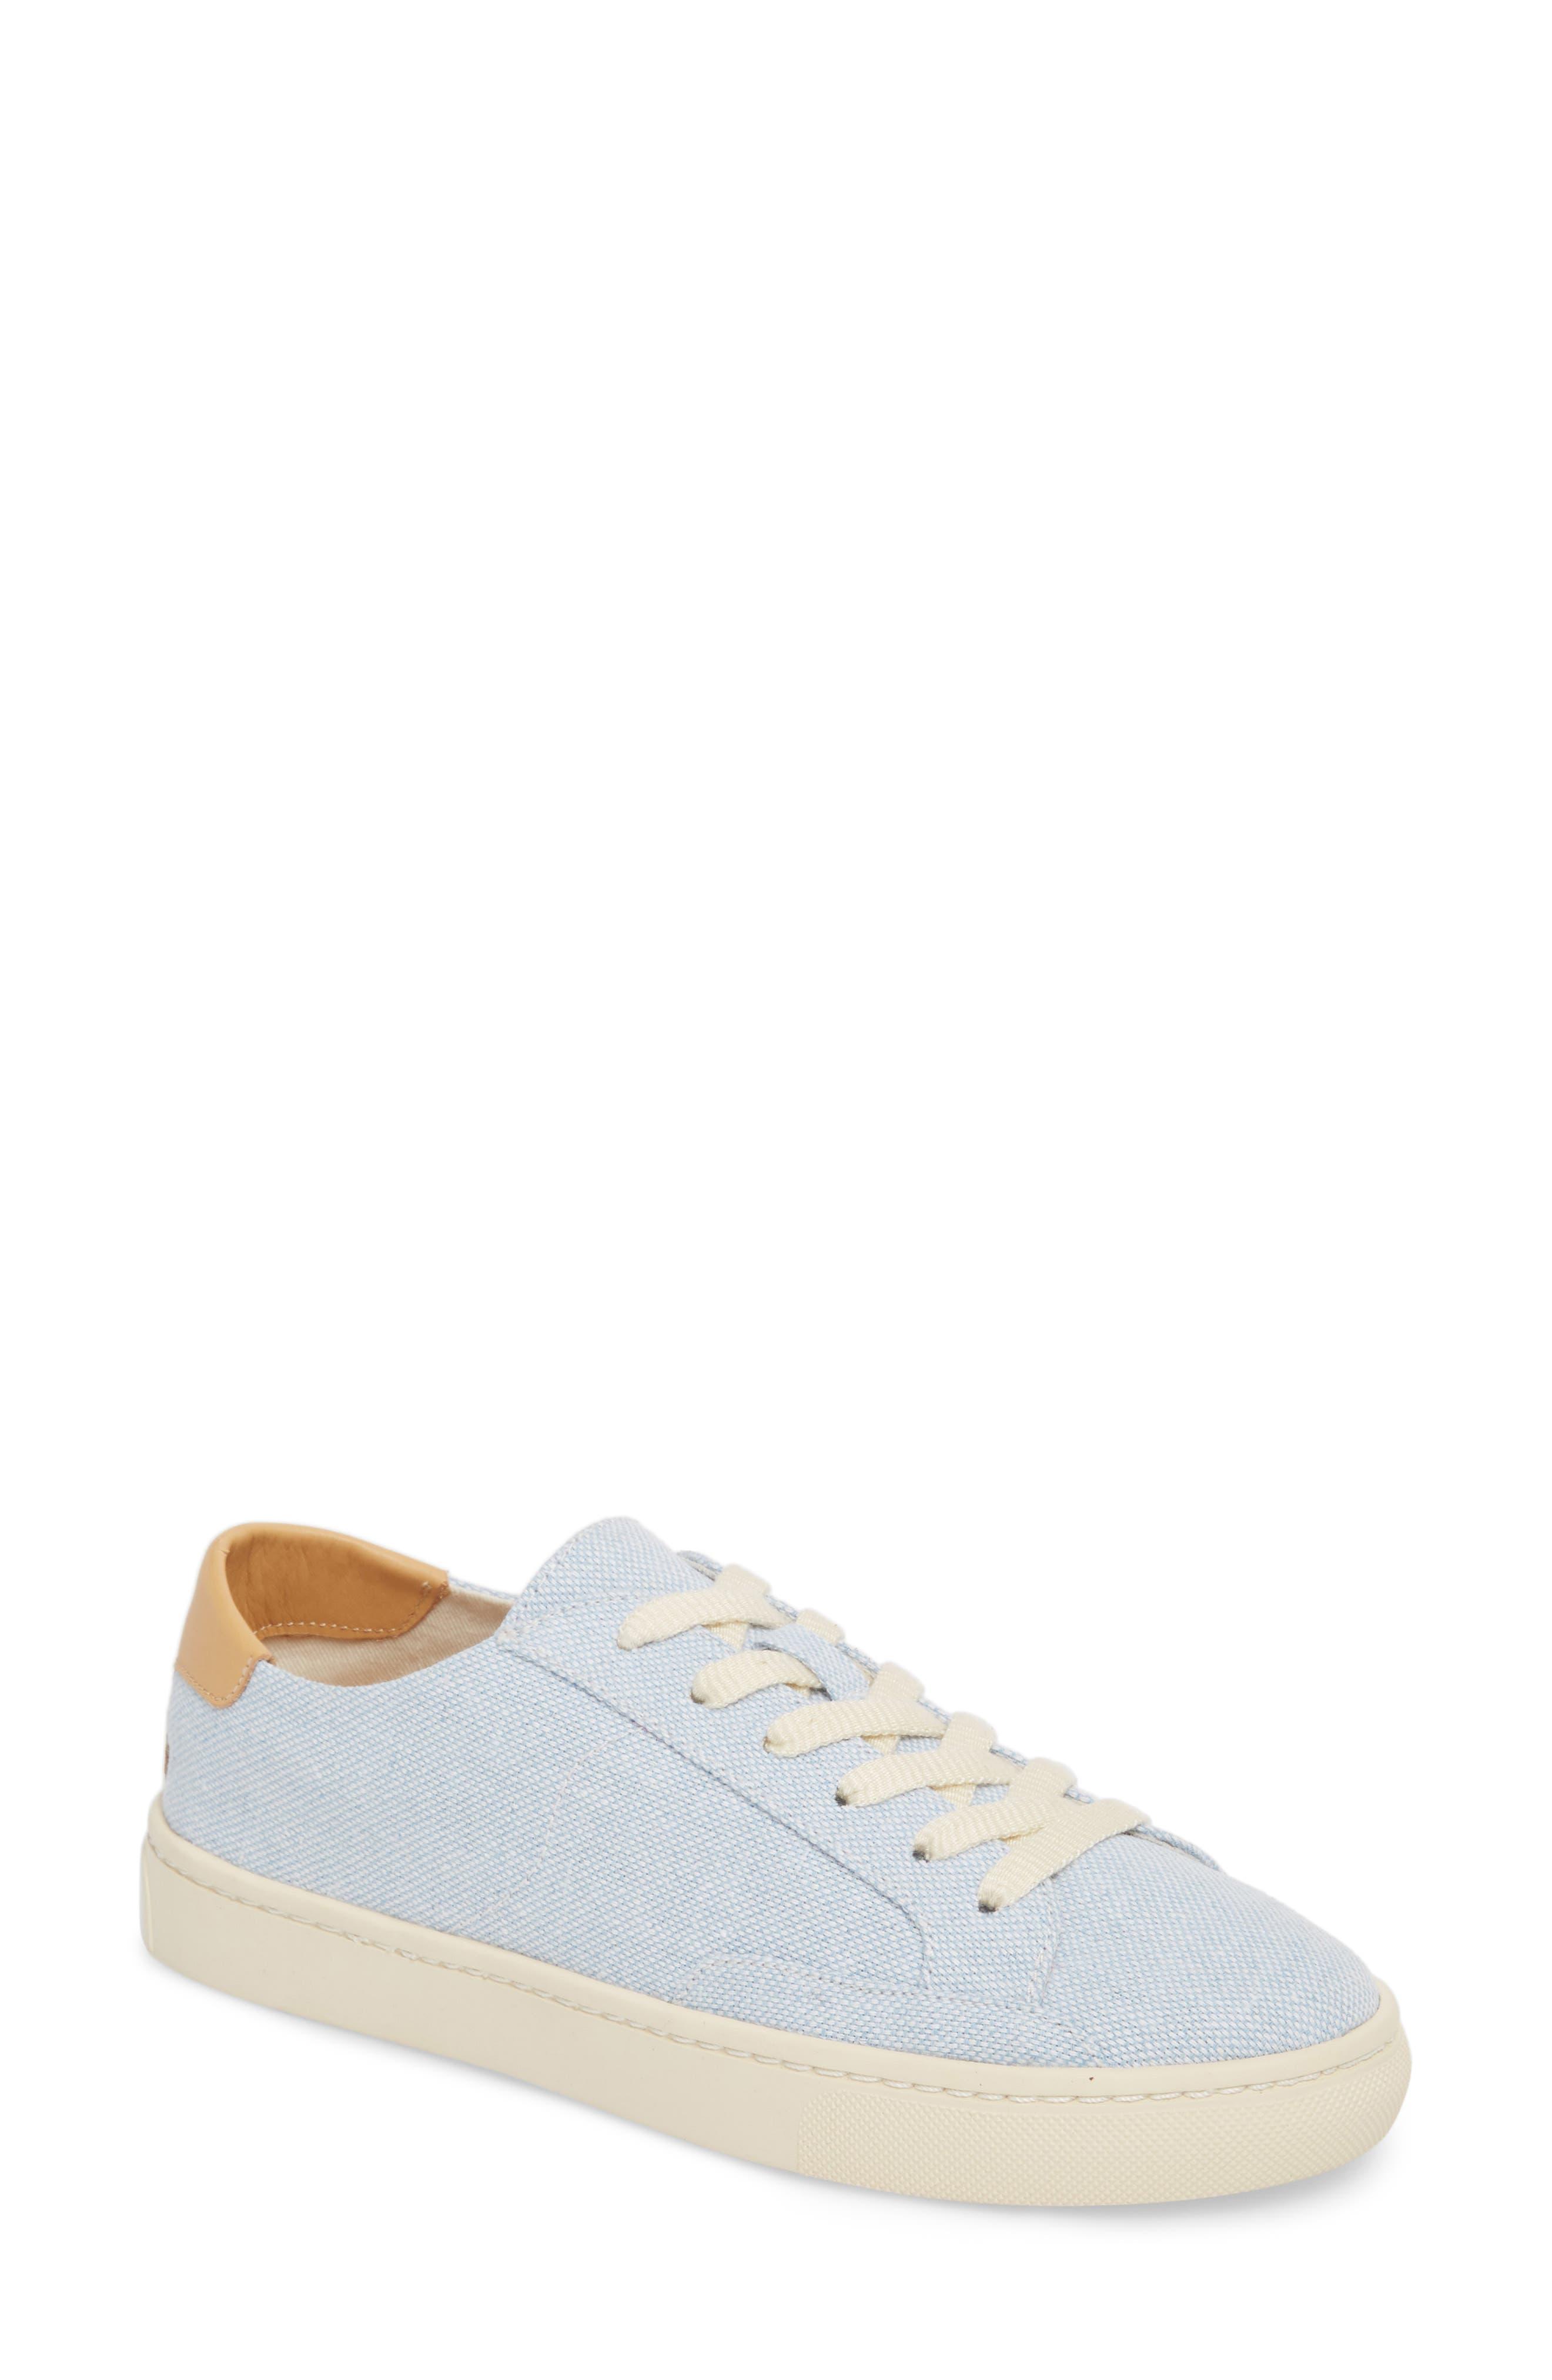 Ibiza Canvas Lace-Up Sneaker,                             Main thumbnail 1, color,                             Sky Blue